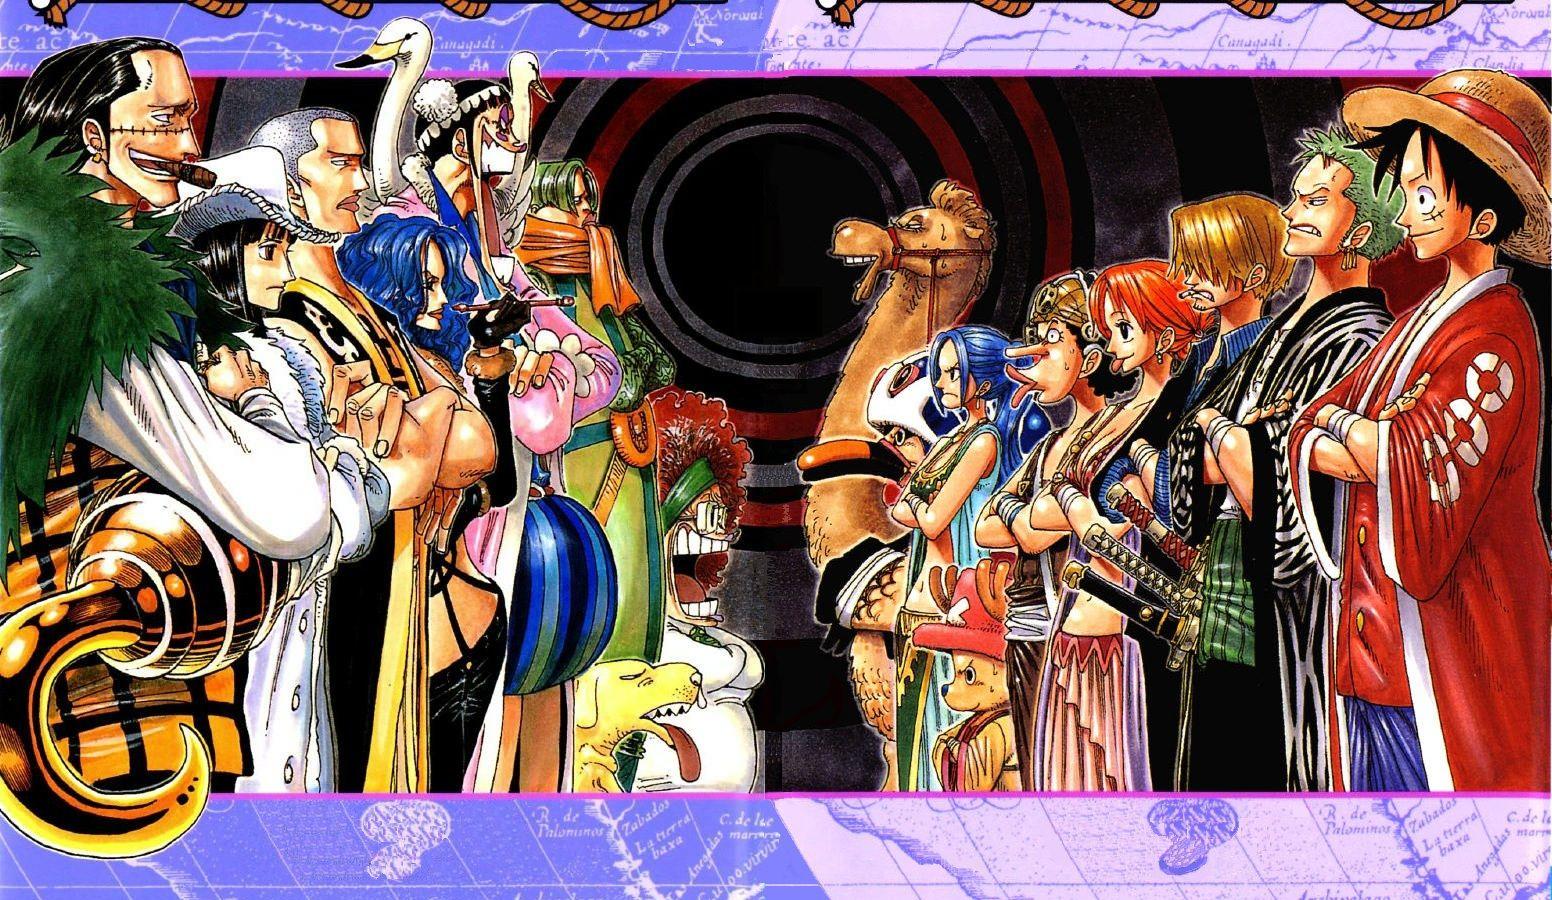 Alabasta Arc Anime One Piece Manga One Piece Images